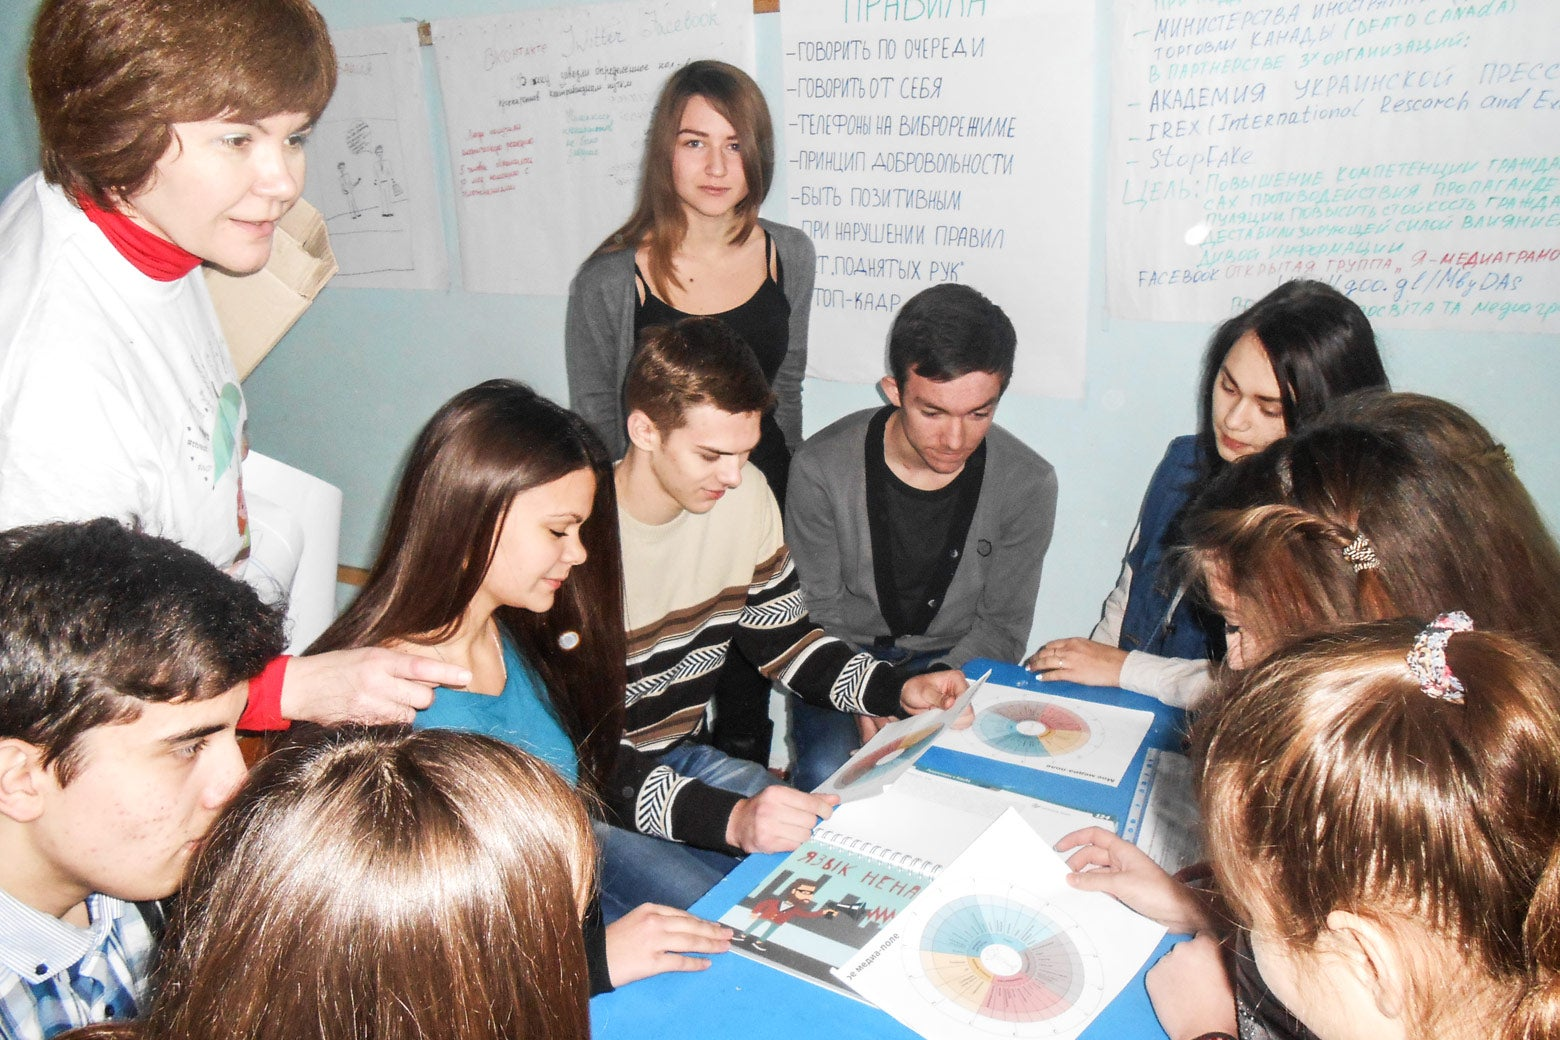 Students in media literacy program UMPP/IREX.